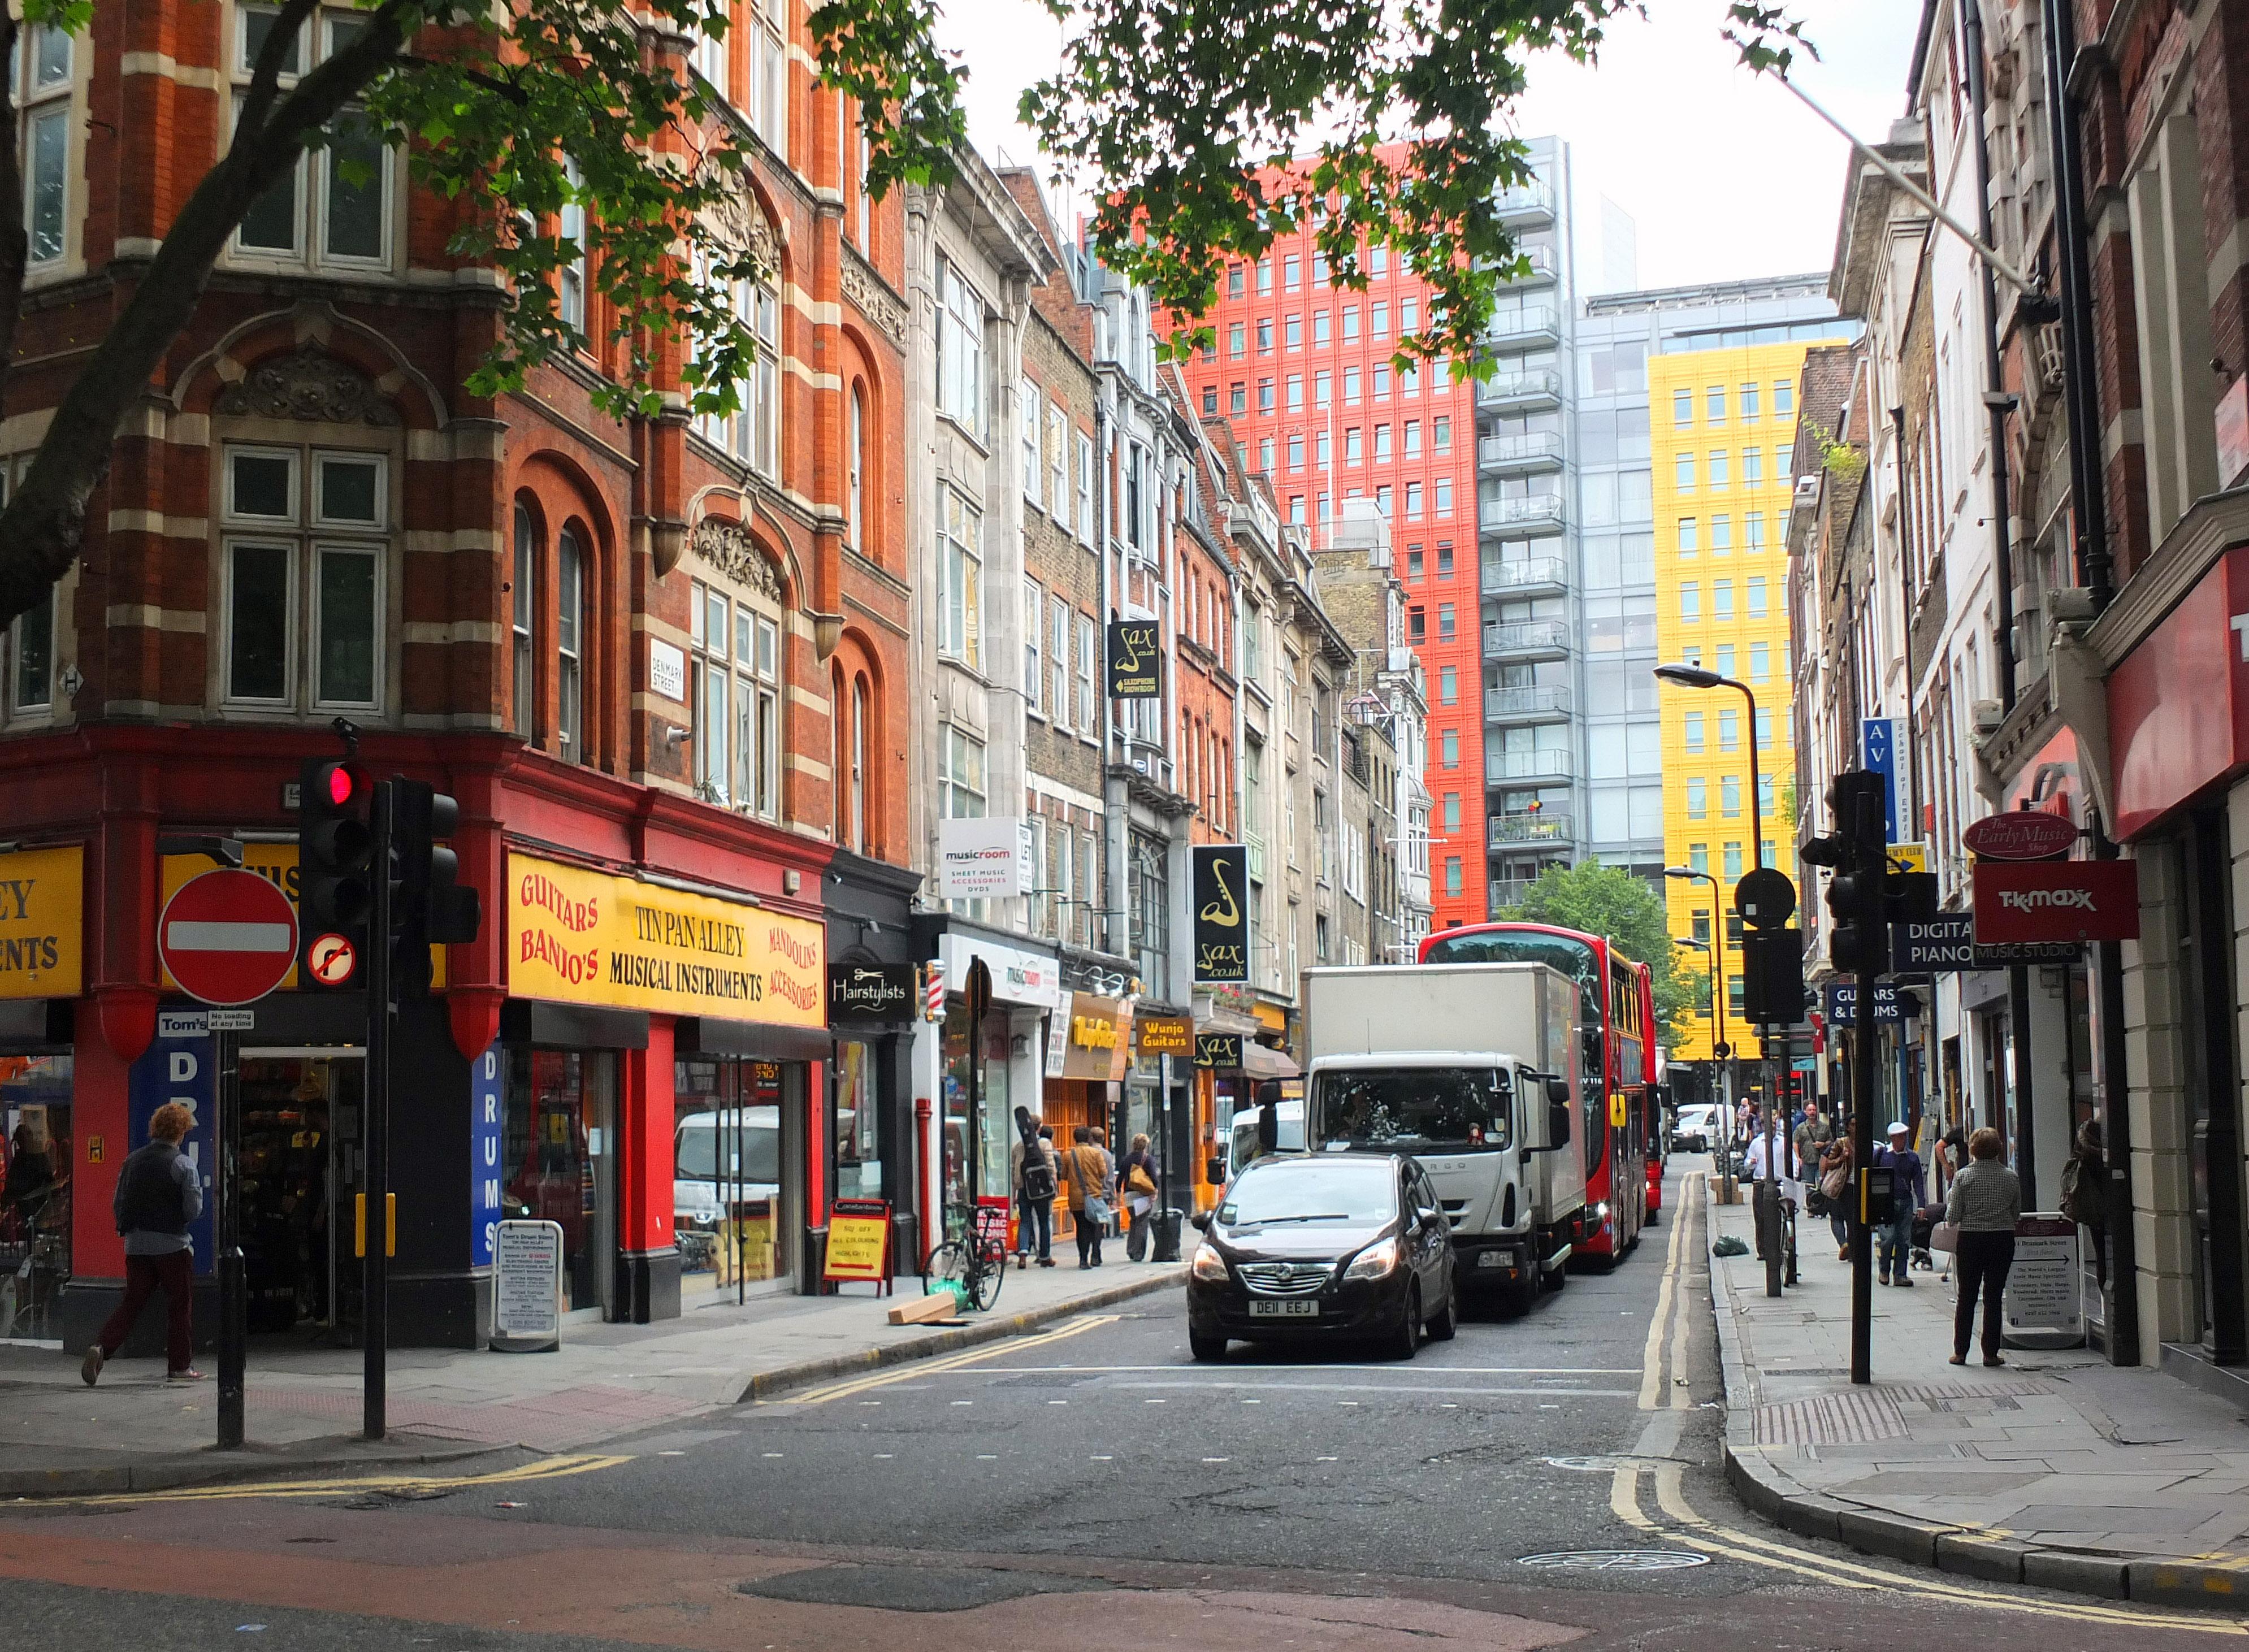 Denmark Street as seen from Charing Cross Road